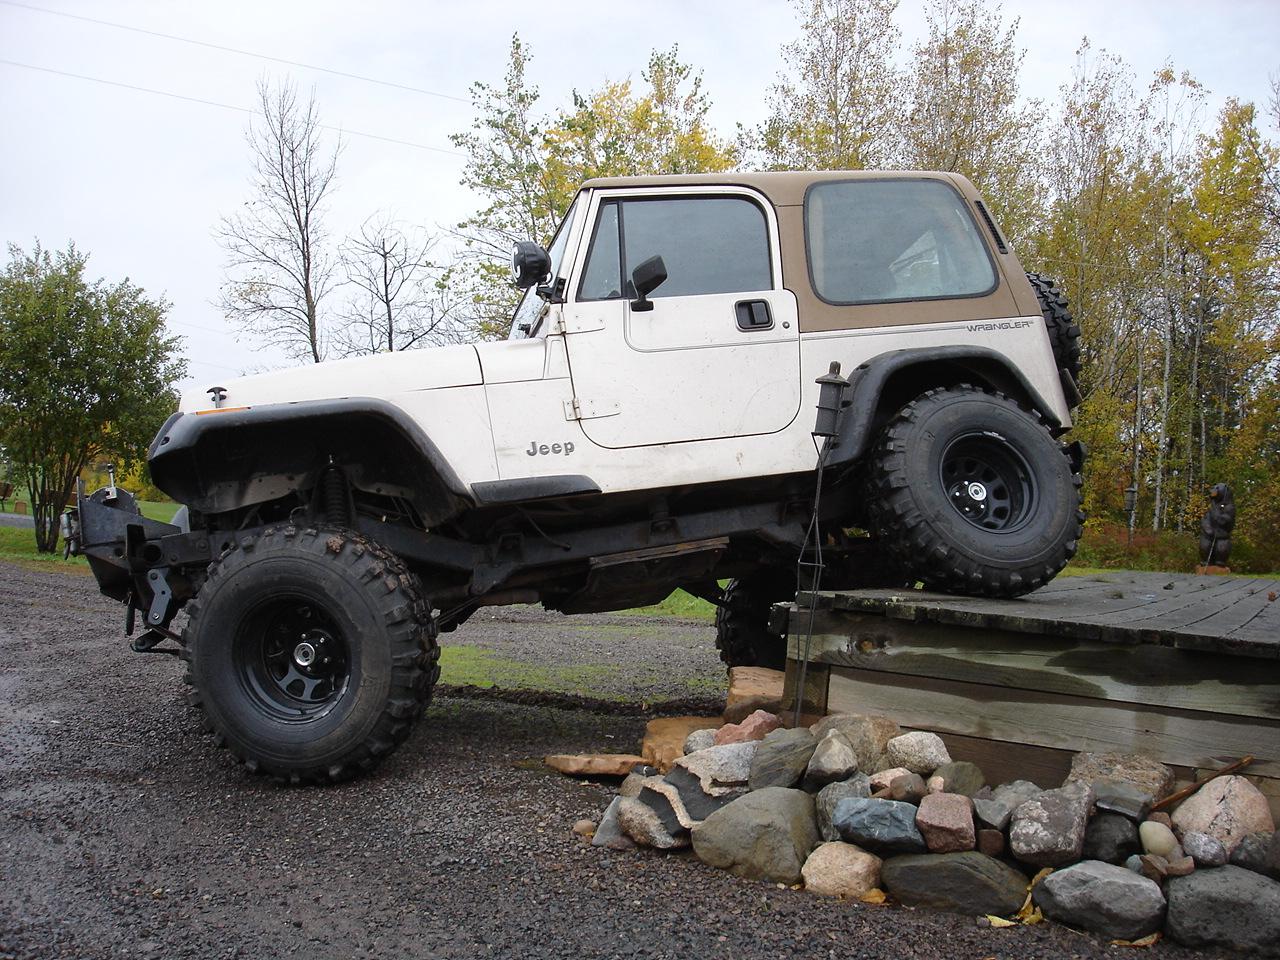 jeep_0173.jpg